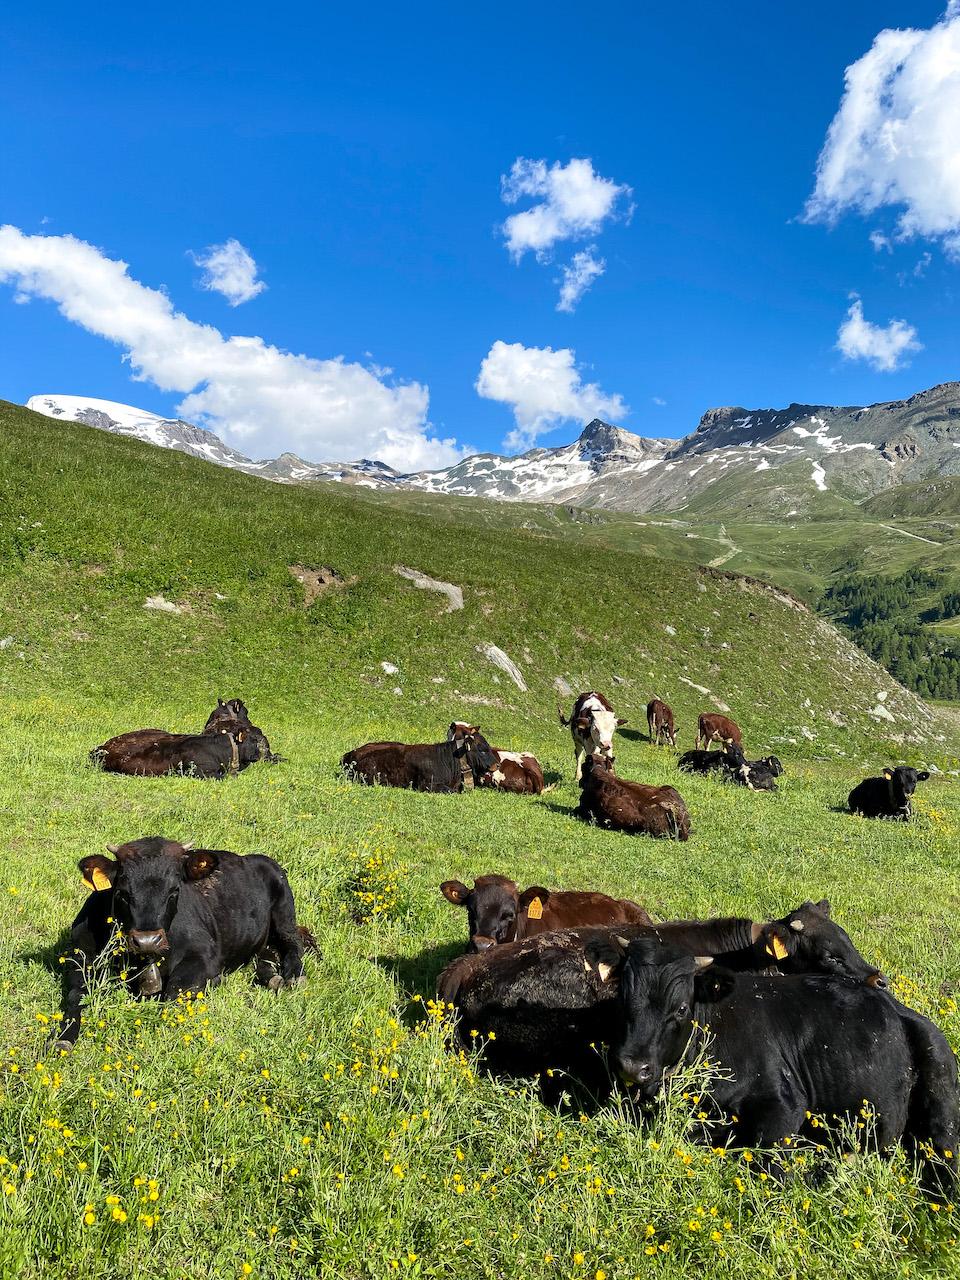 Zomerski in Italie Breuil-Cervinia, matterhorn